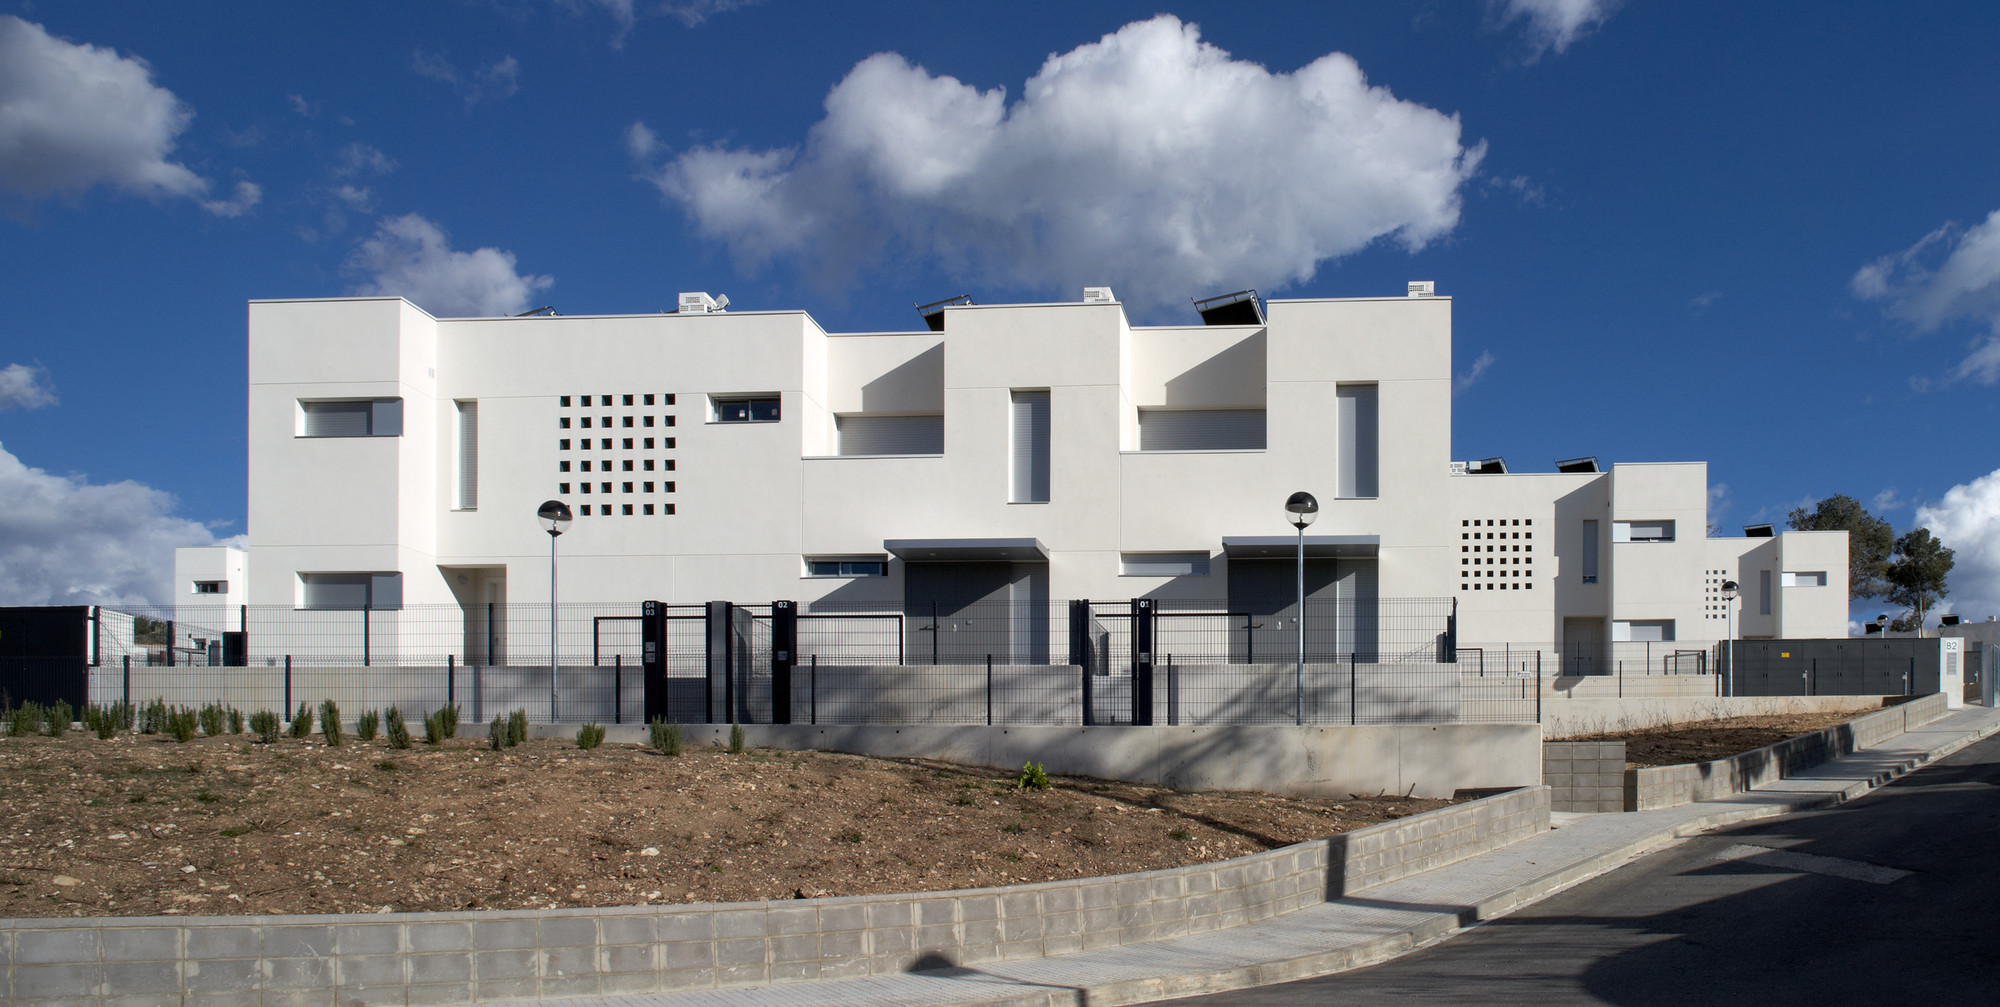 52 Social Housing in Tarragona  / aguilera|guerrero architects, © Pepo Segura